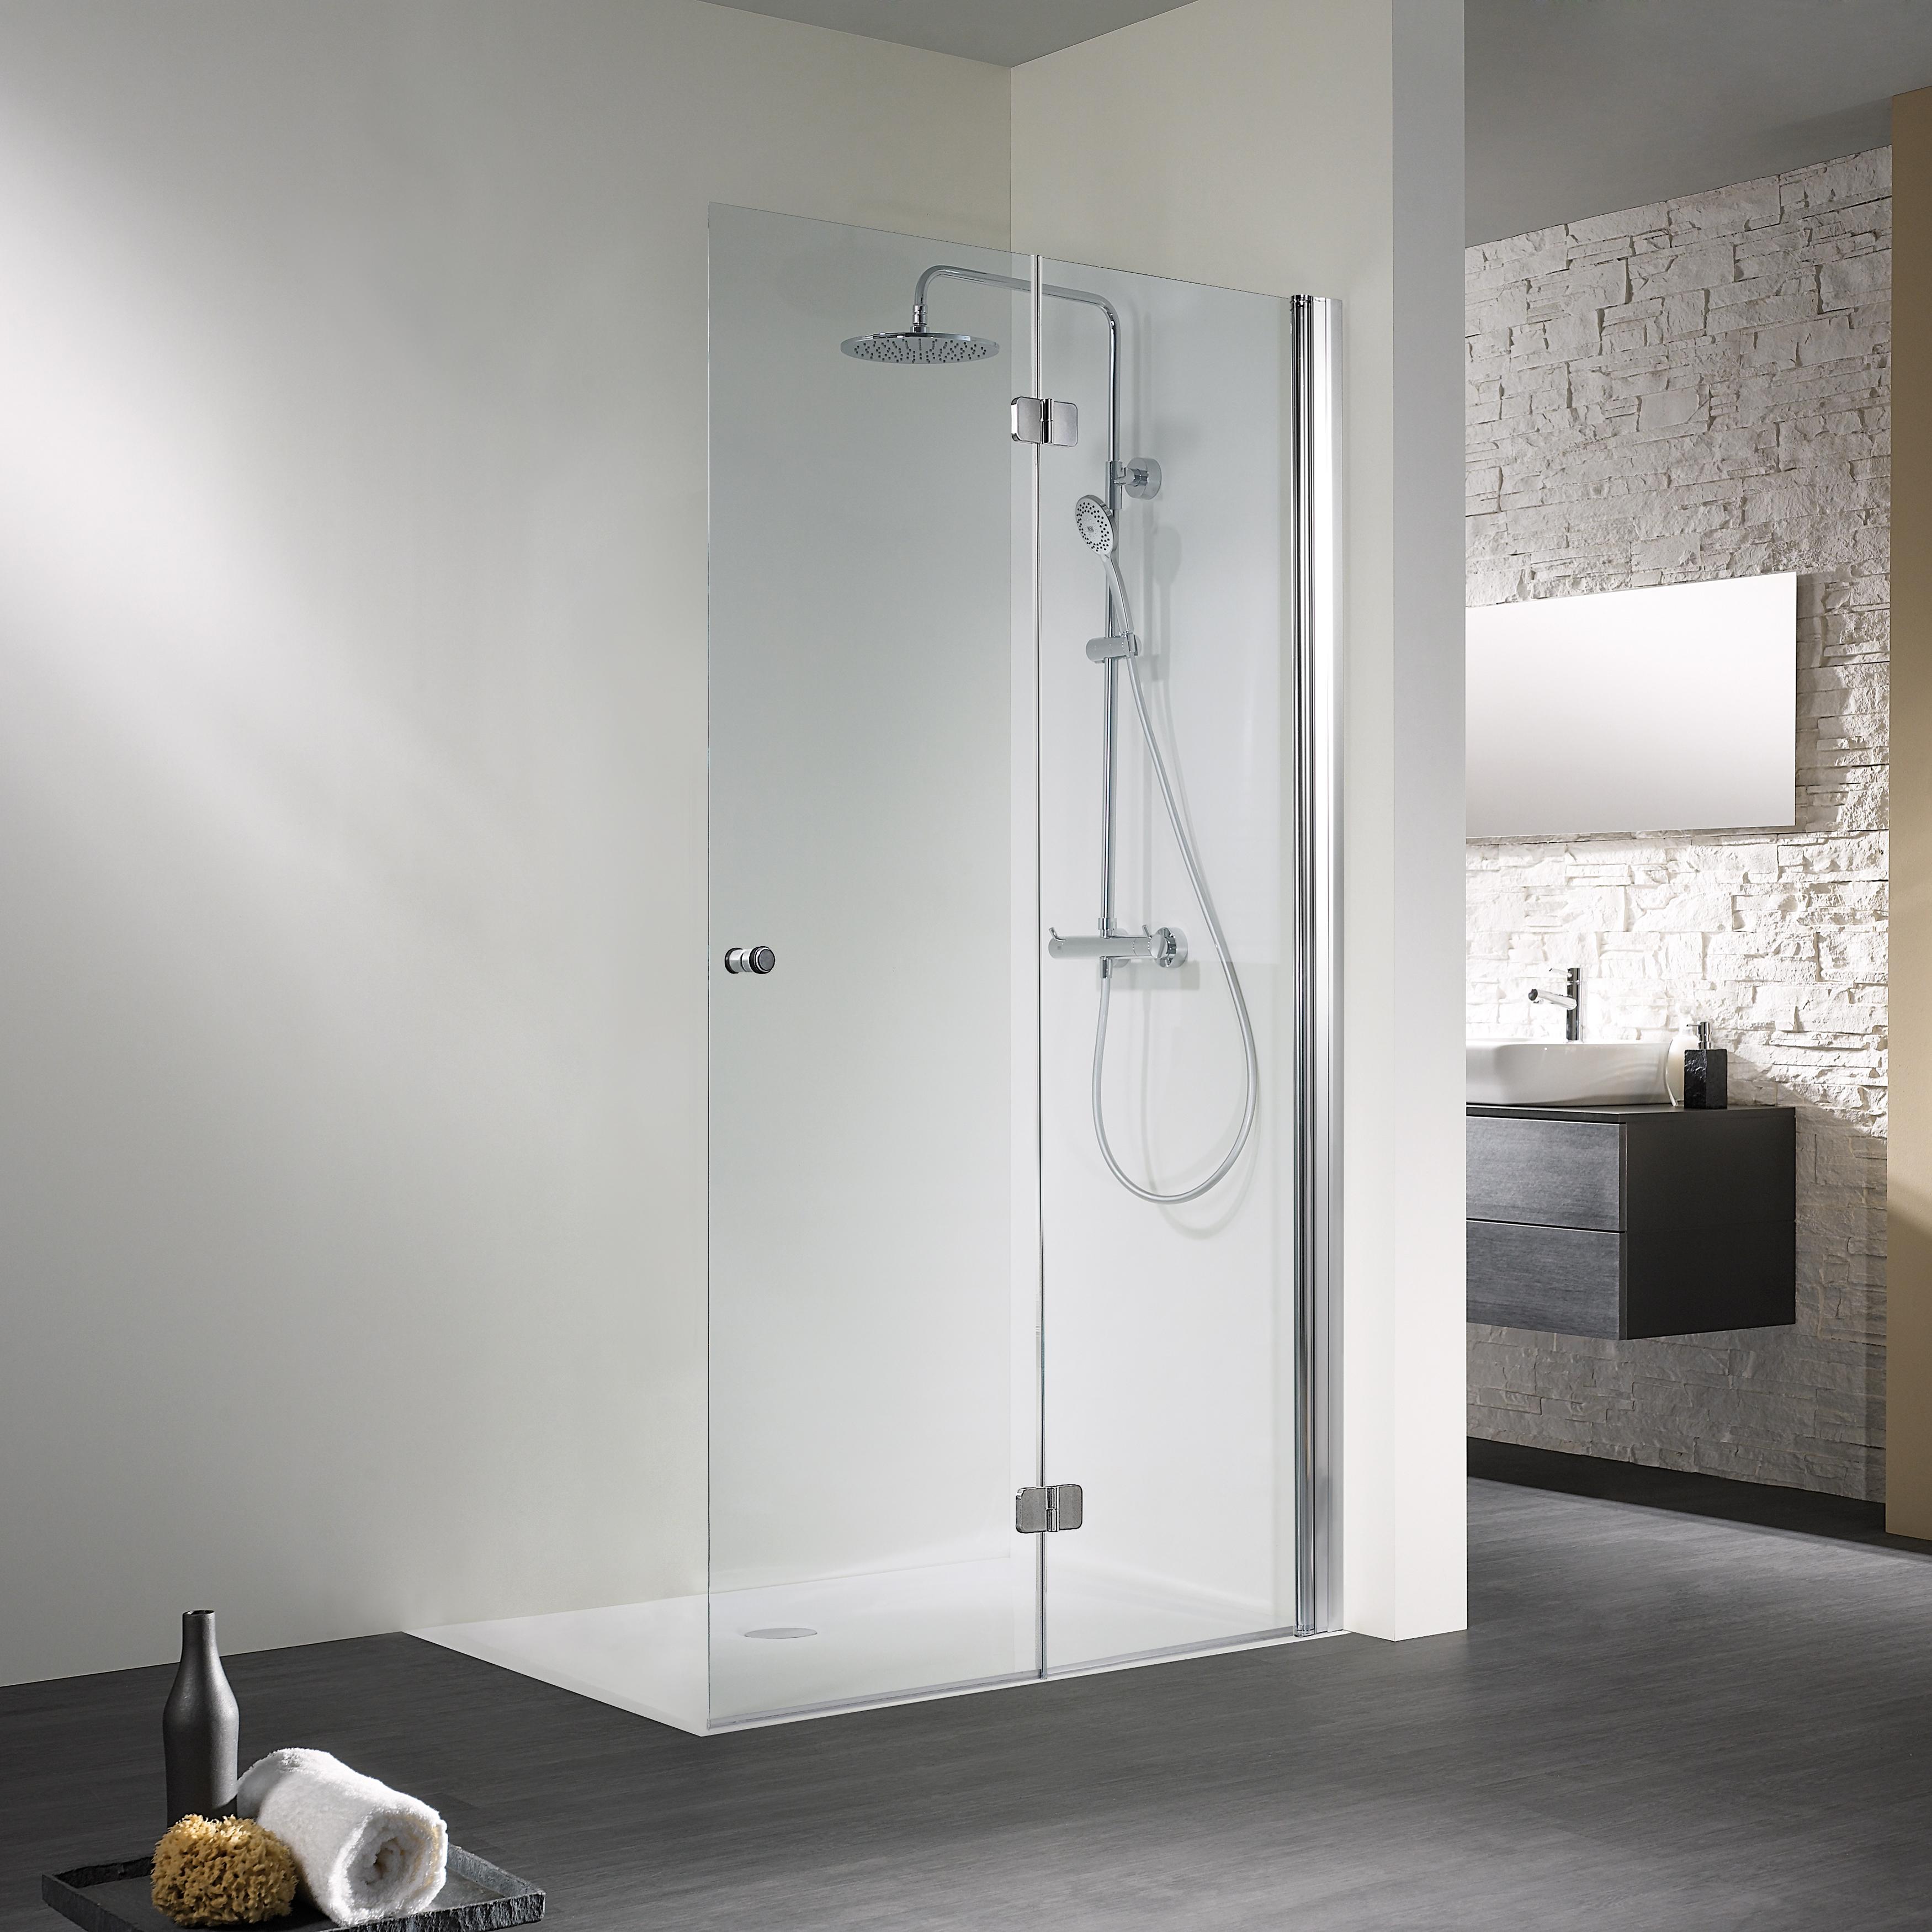 Hsk Walk In.Hsk Showers Kg Walk In Exklusiv